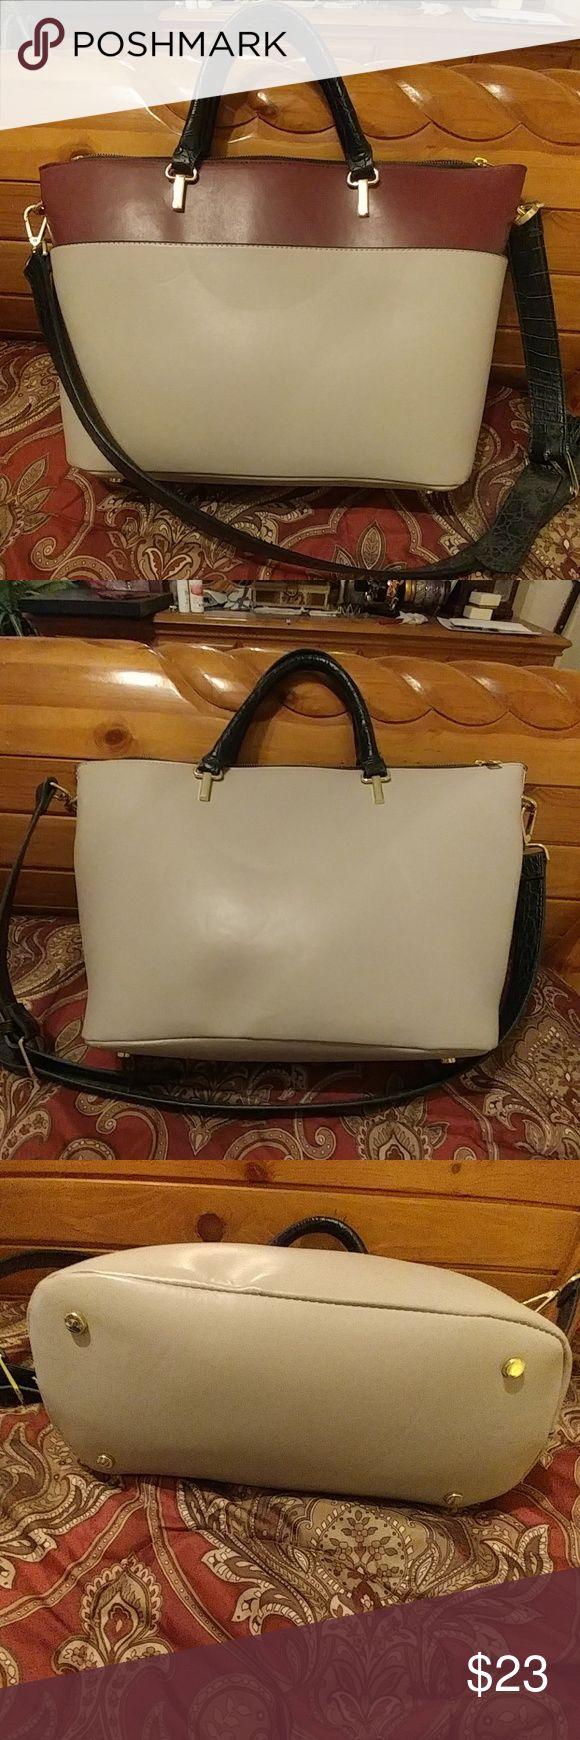 H&M handbag Satchel used once H&M Bags Satchels